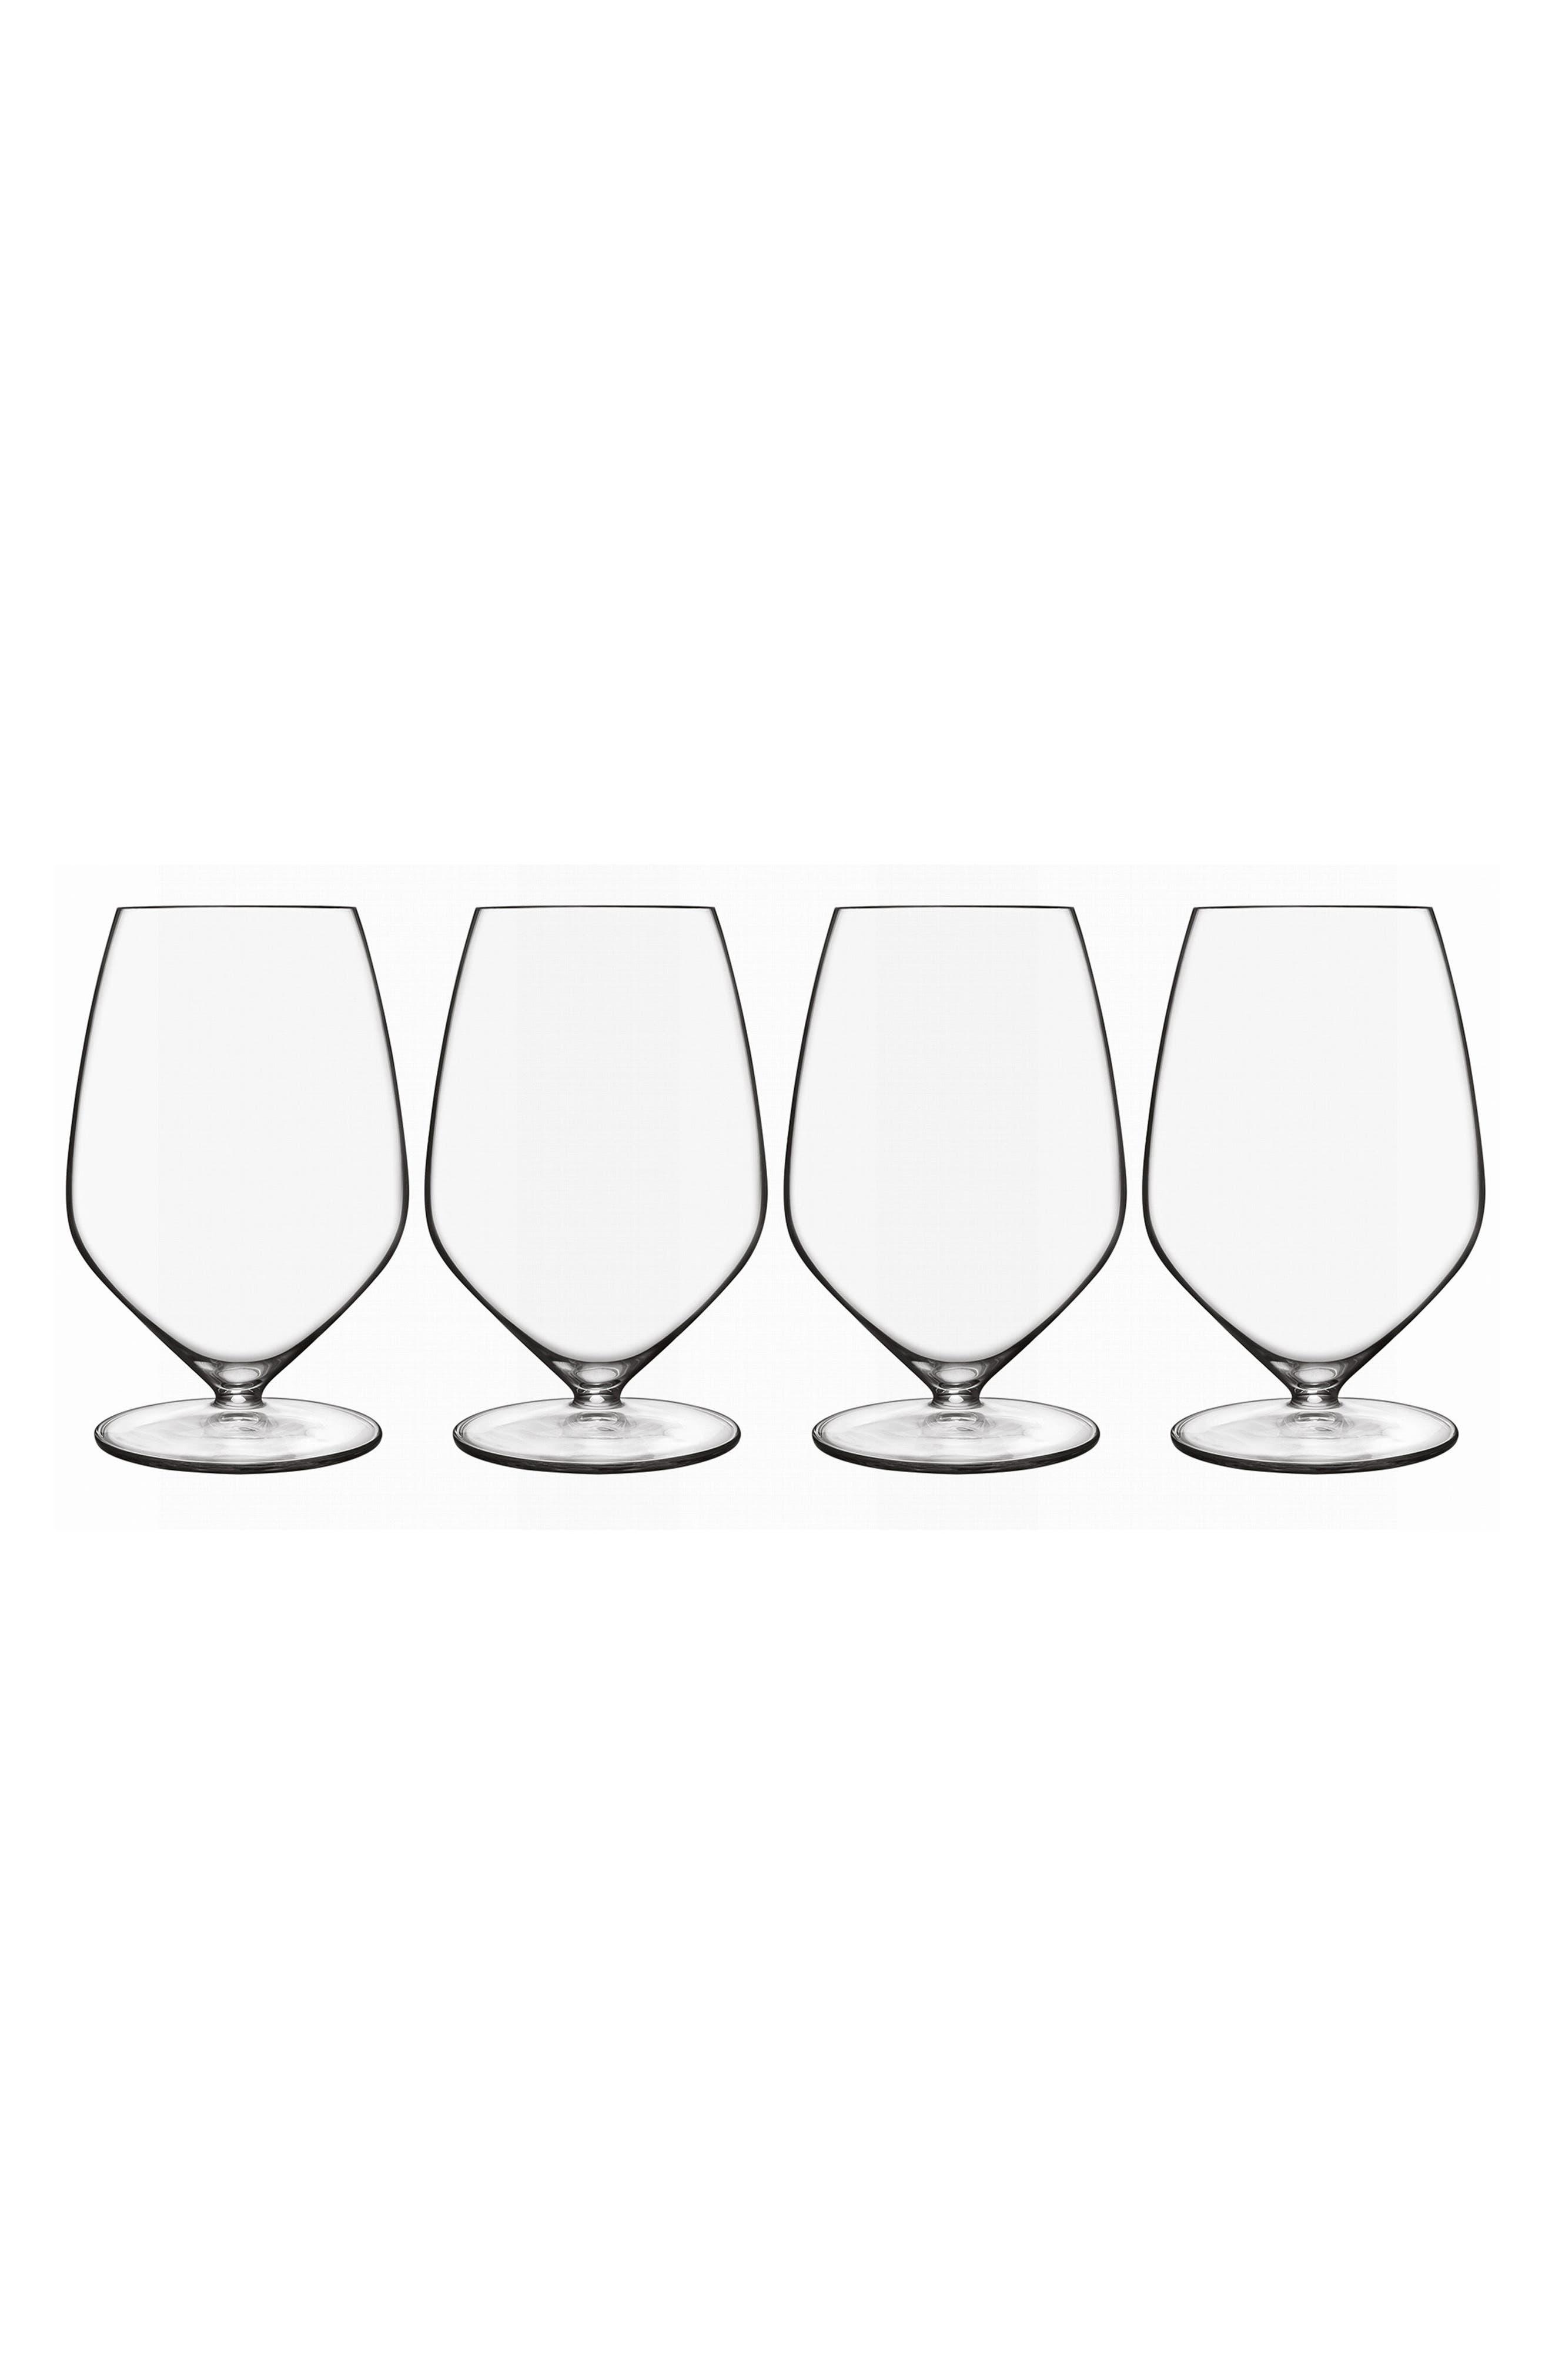 T-Glass Set of 4 Cabernet/Merlot Glasses,                             Main thumbnail 1, color,                             Clear